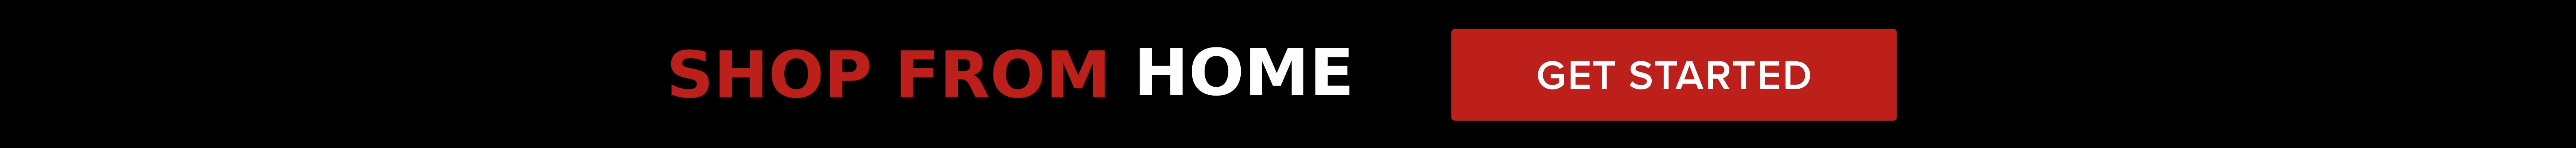 shop form home